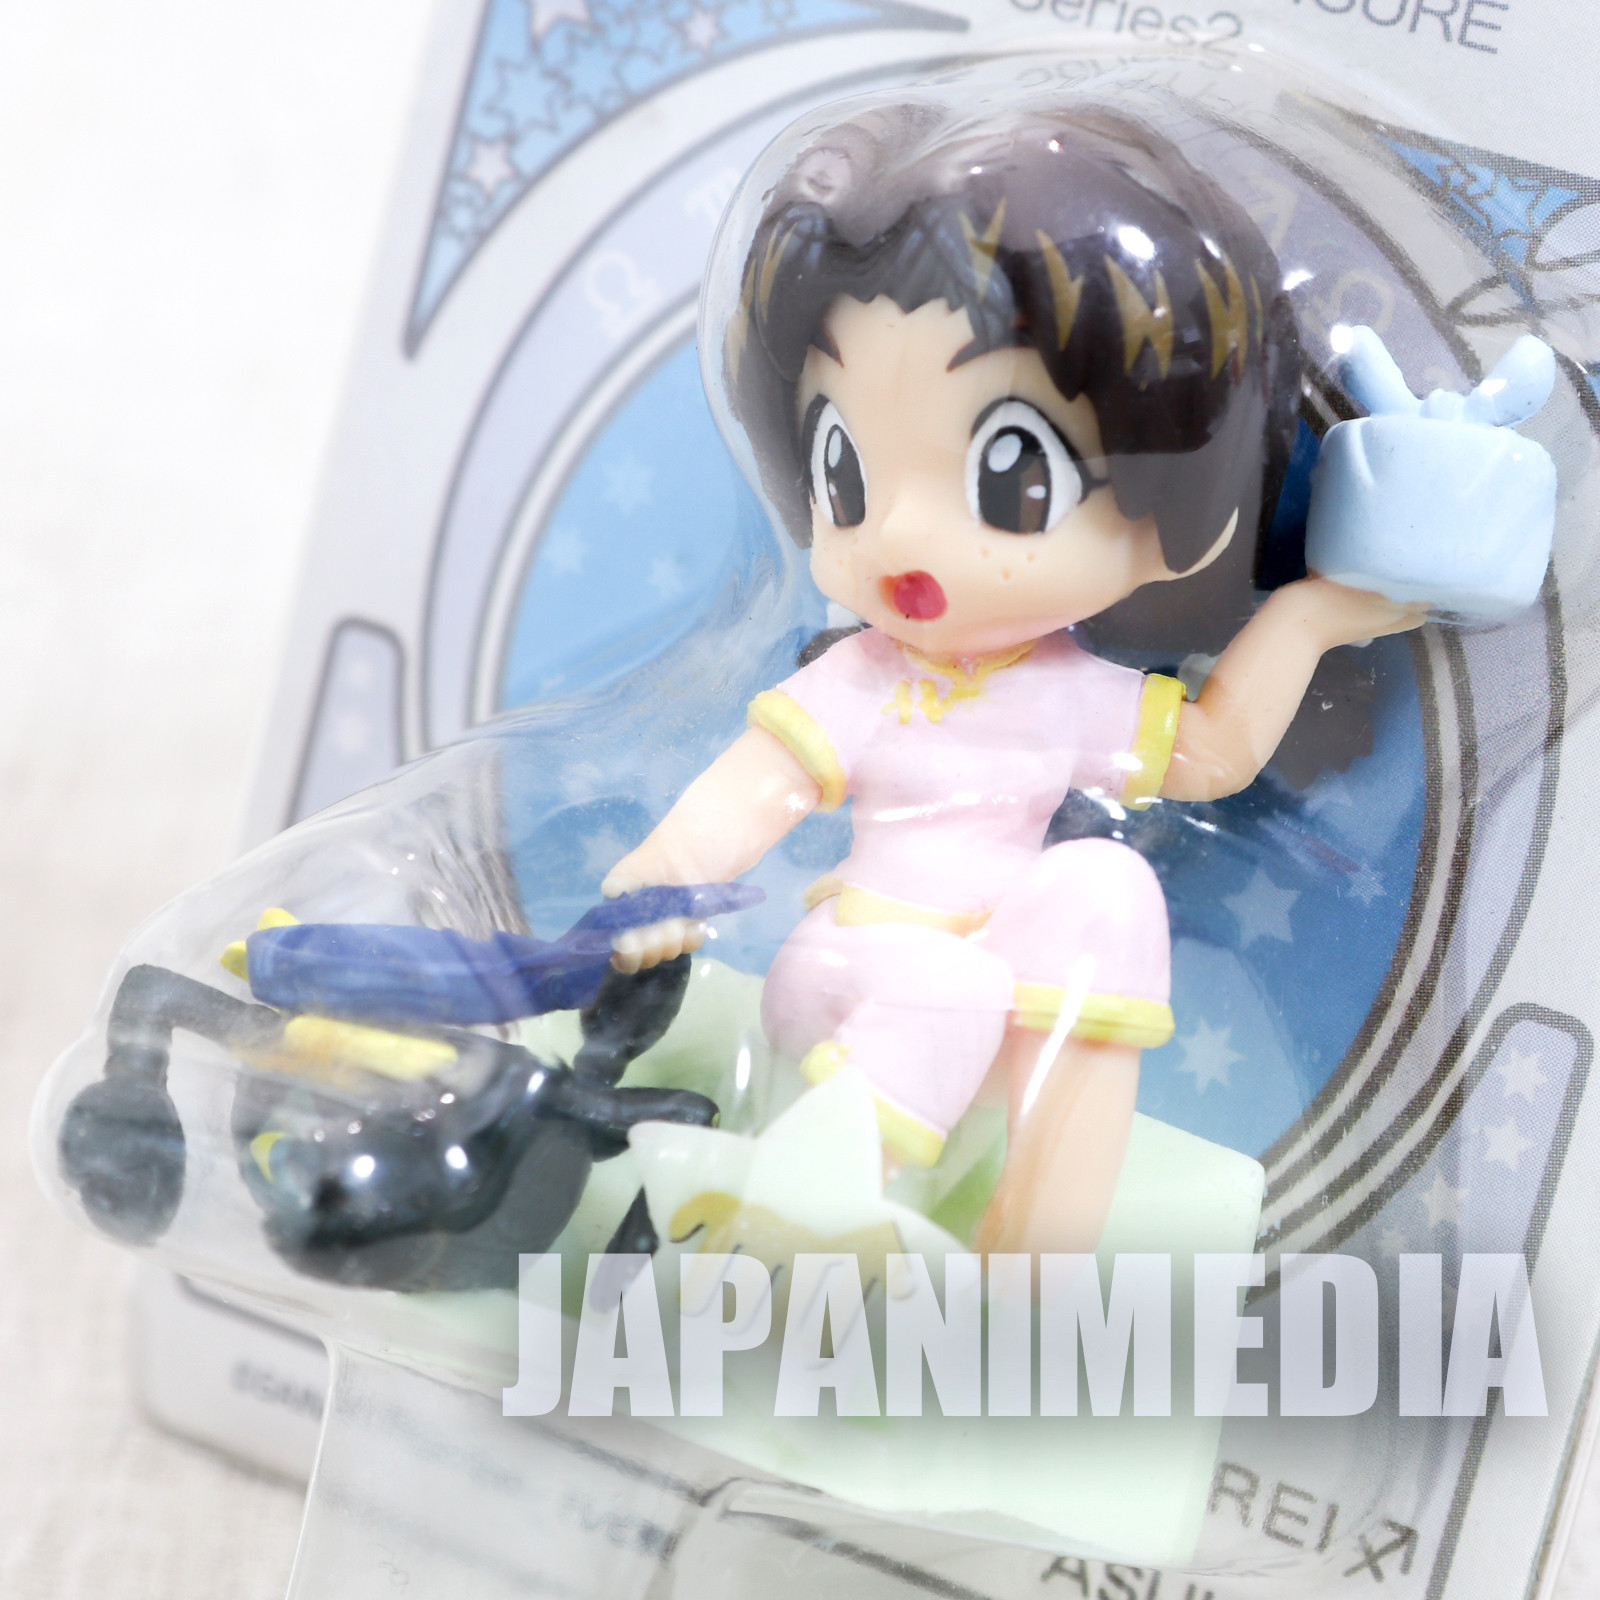 Evangelion Hikari Horaki Mini Display Figure Star and Constelation ver. JAPAN